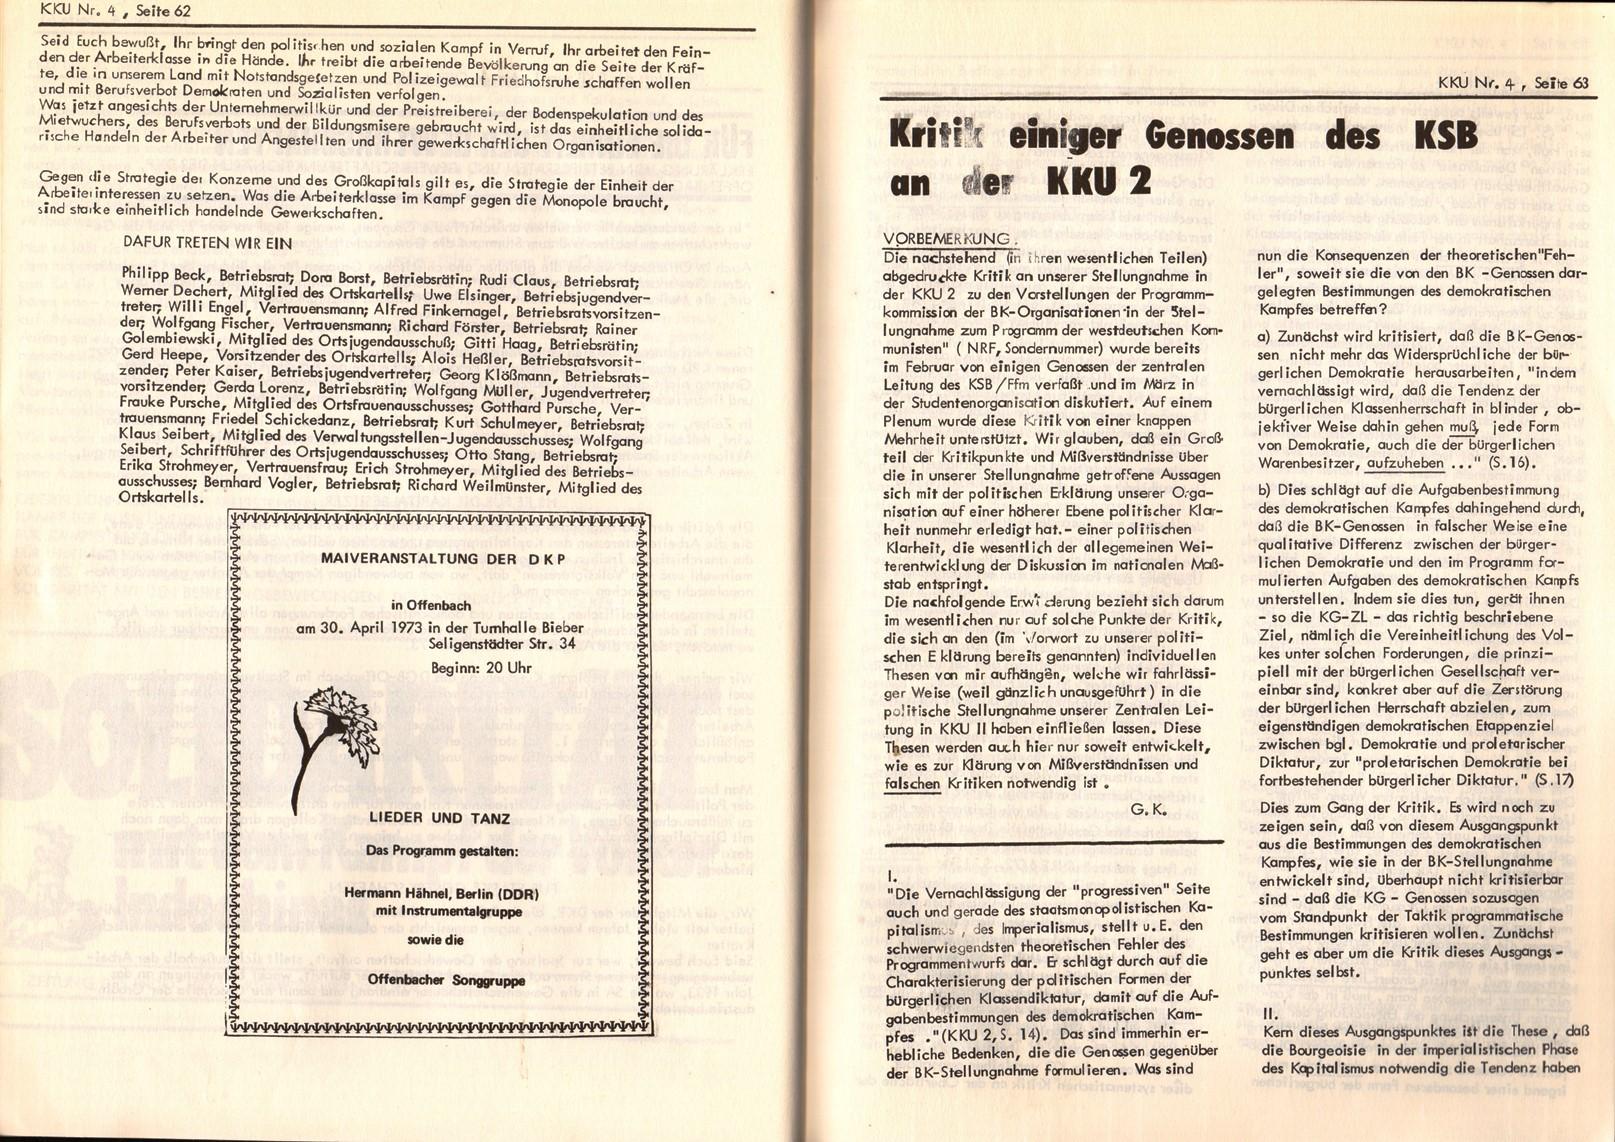 Frankfurt_Offenbach_KG_Kampf_Kritik_Umgestaltung_1973_04_05_32